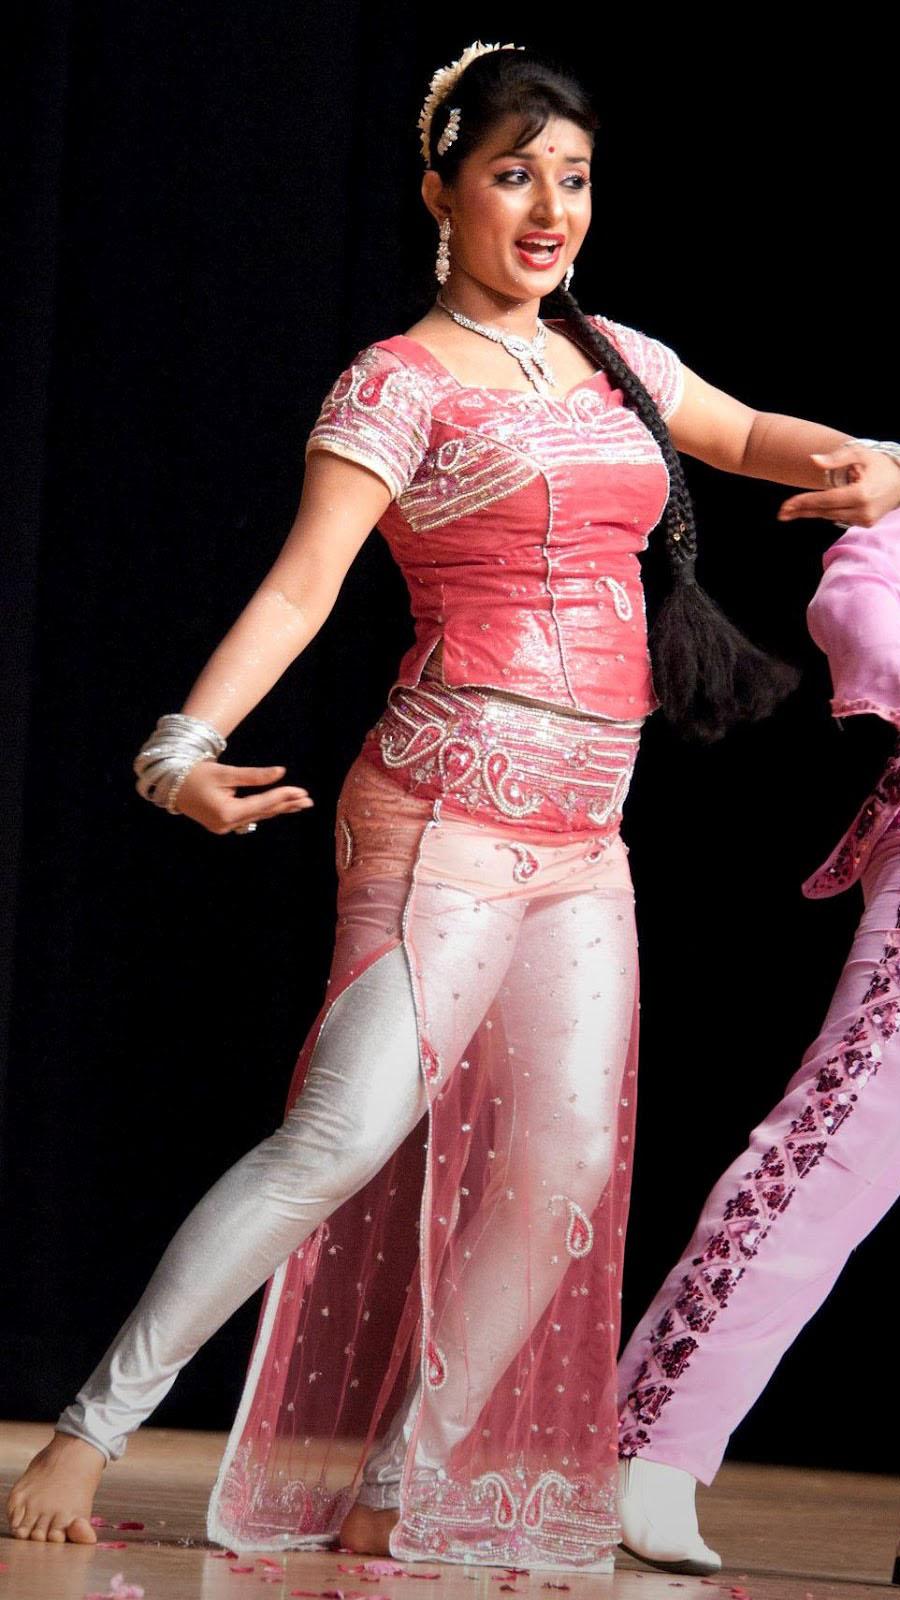 loveing heavenly Meera jasmine dancing unseen photo gallery